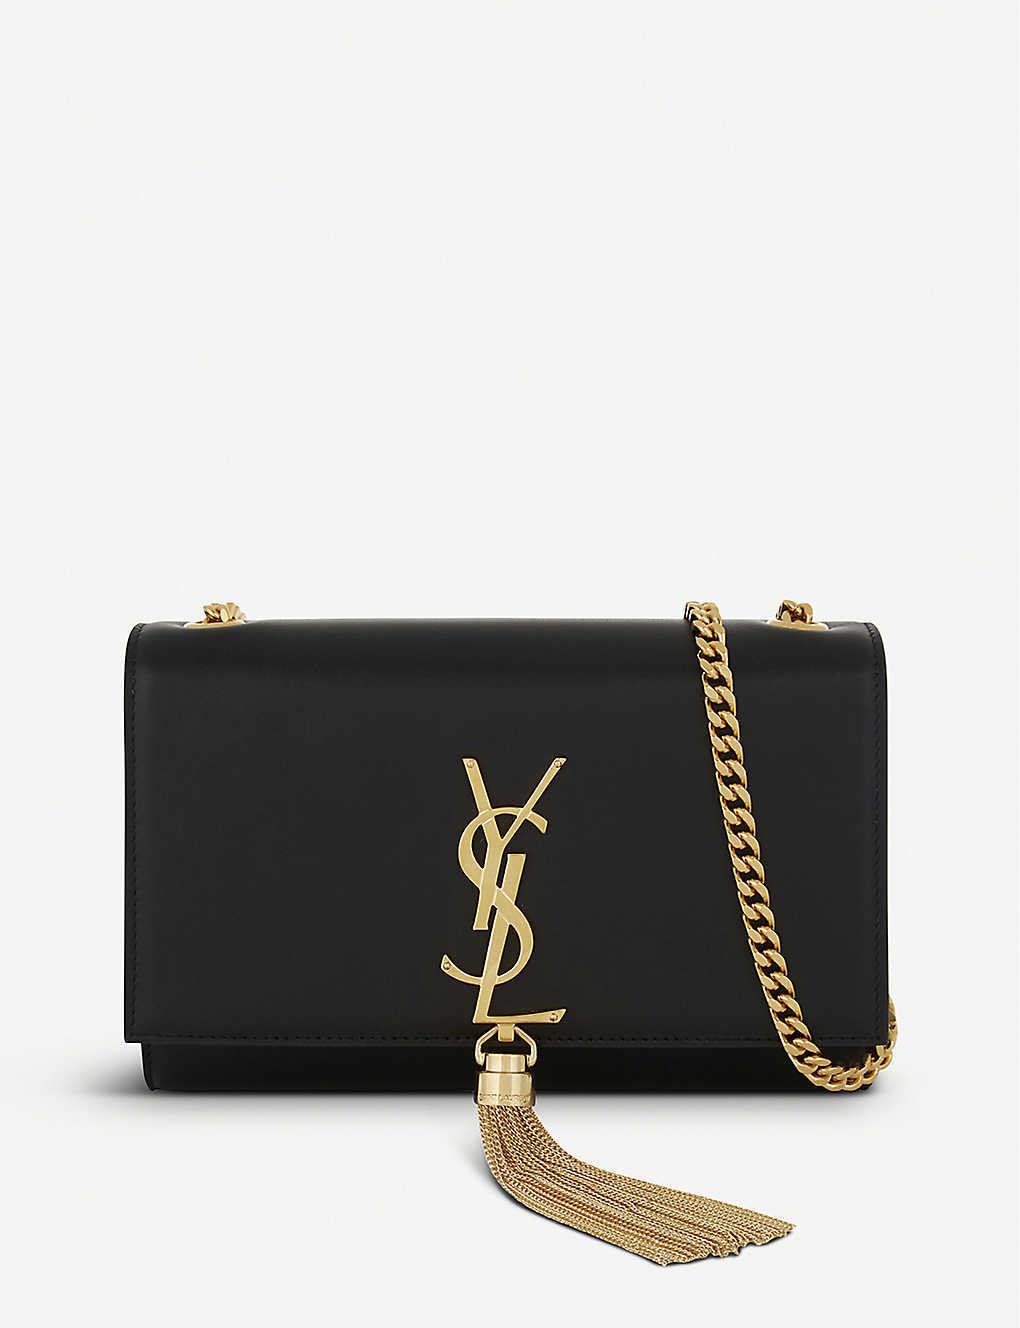 3772b4a93ca SAINT LAURENT - Kate tassel monogram small leather cross-body bag ...